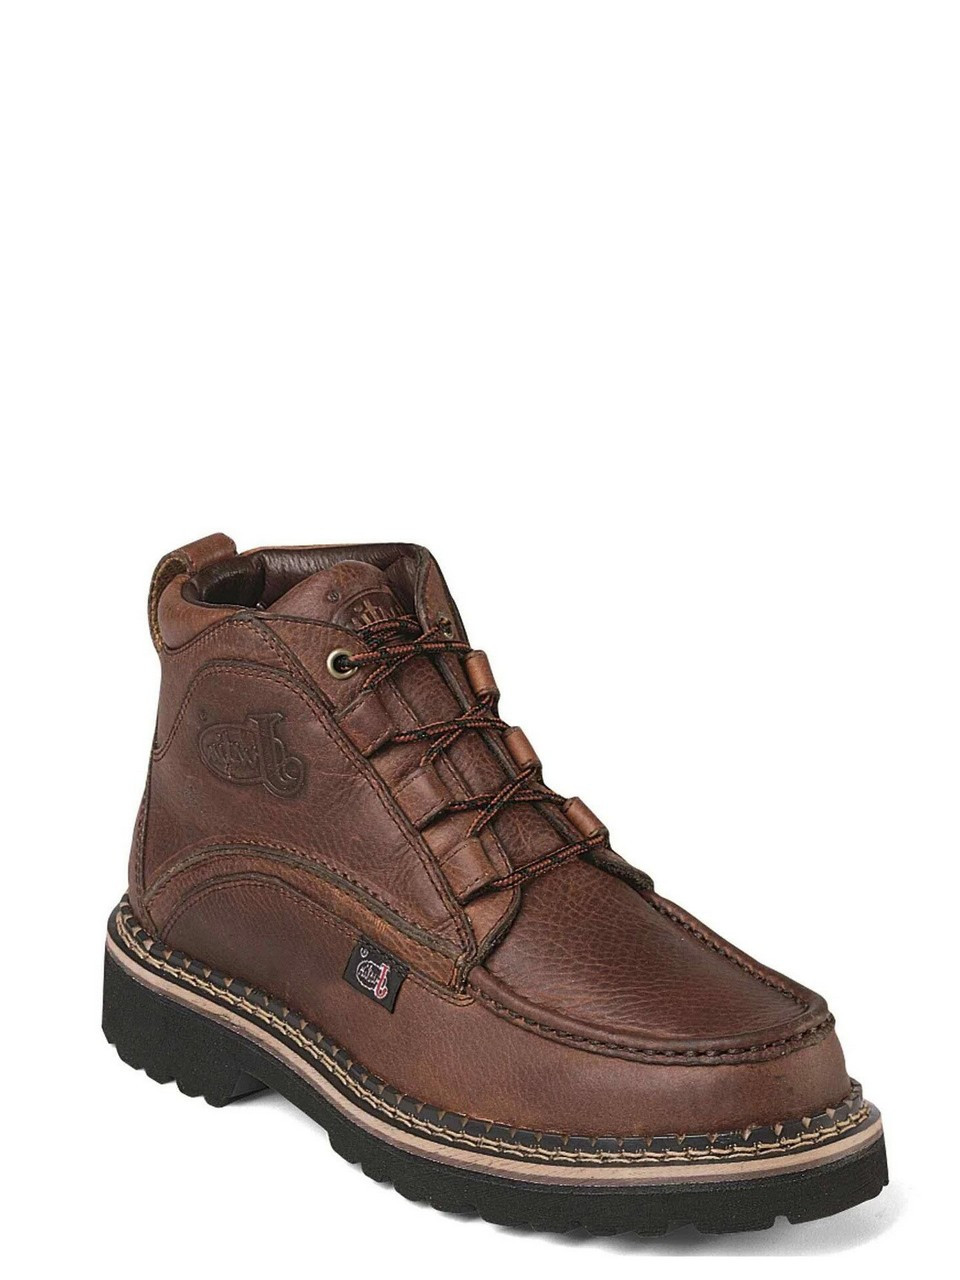 Justin® Men's Rustic Cowhide Chukka Boot